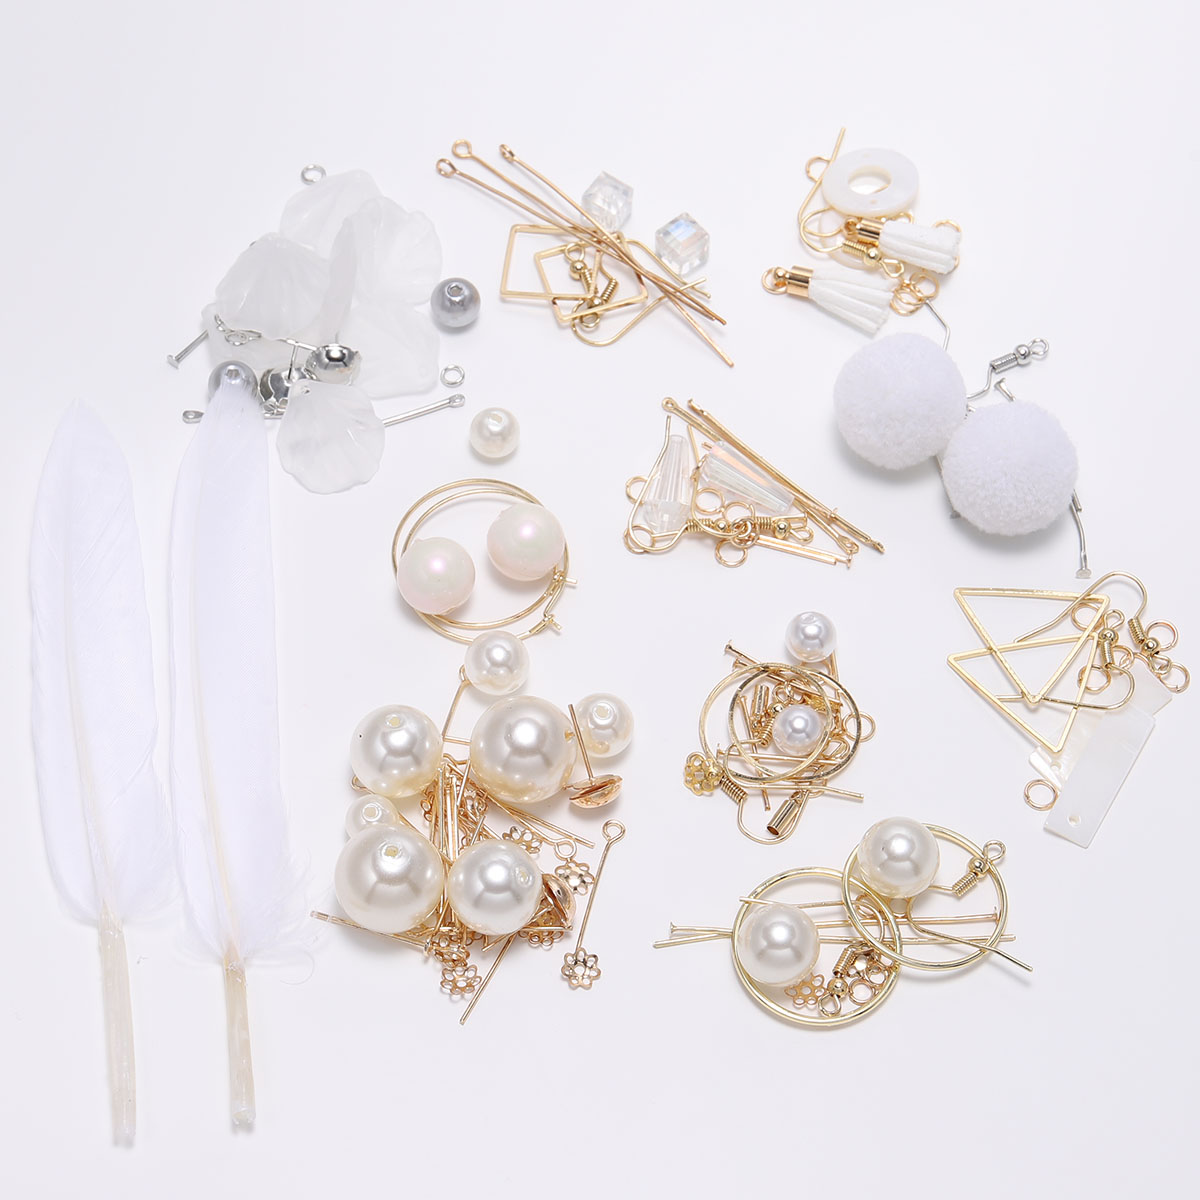 US $6.47 30% OFF|Bohemian Sea Ocaen White Feather pearl Earring Accessory DIY Jewelry Package Hooks For Earrings Women Gift Handmade Supplies on AliExpress